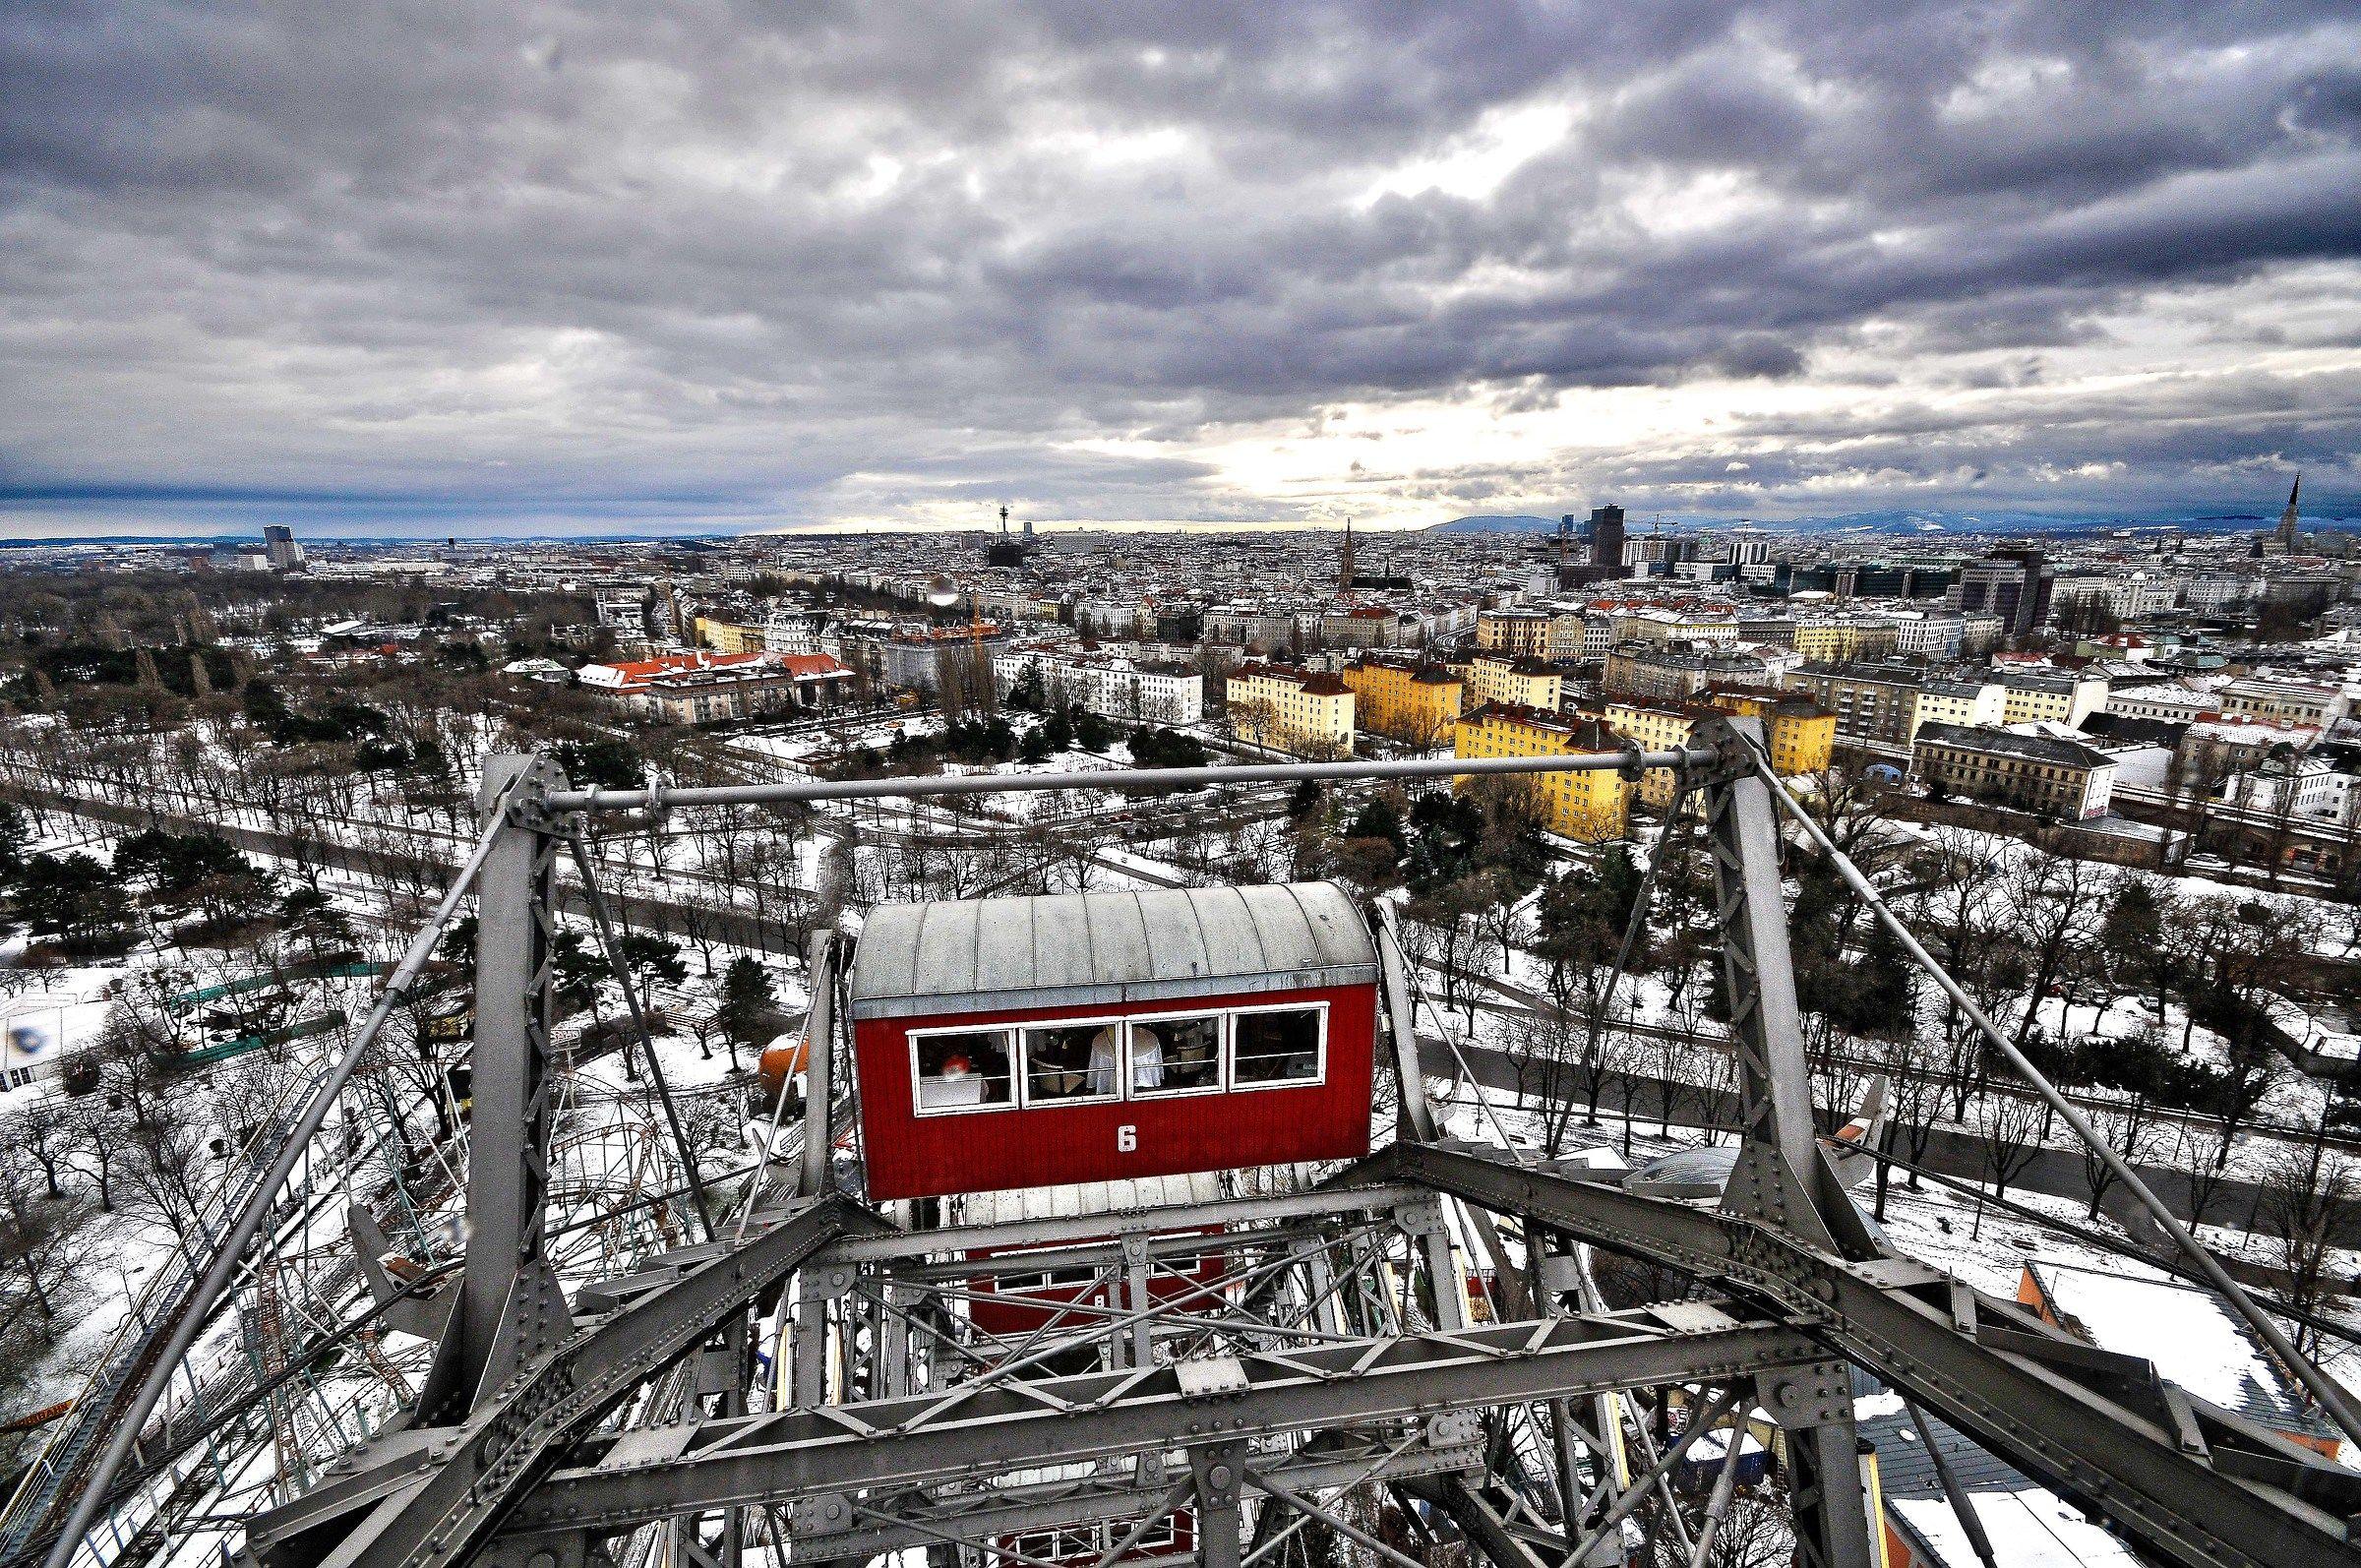 the Ferris wheel...